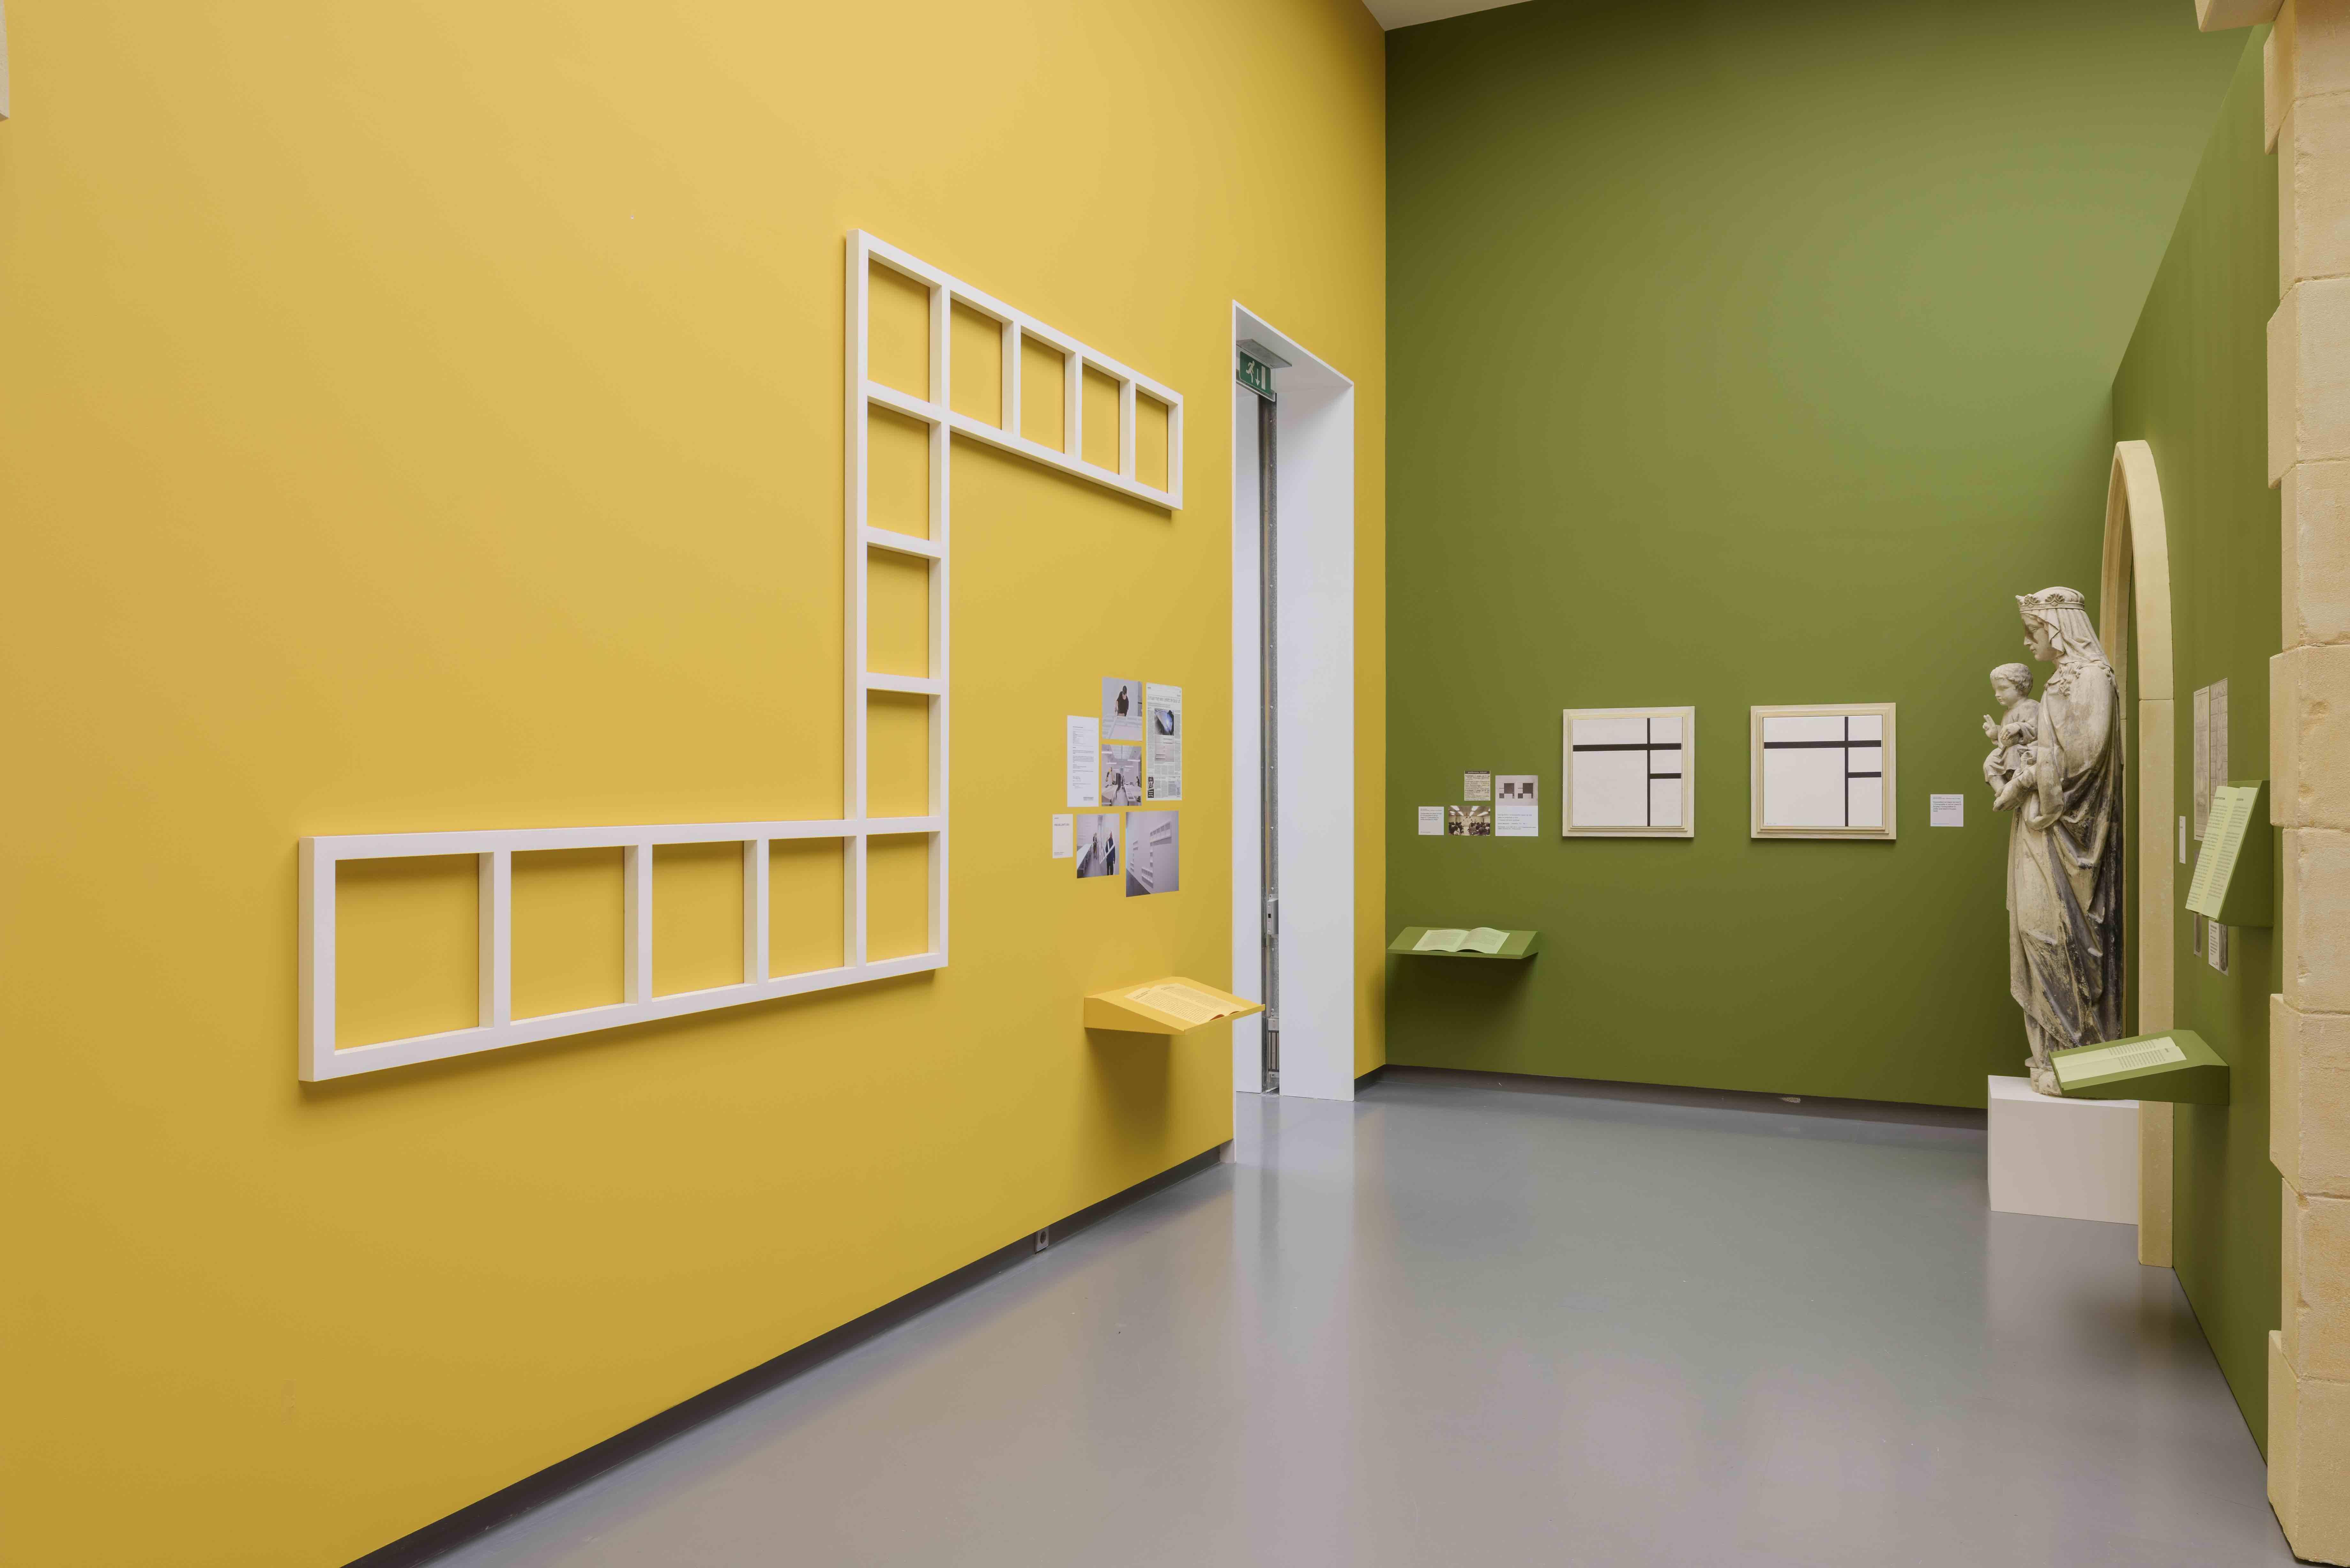 Installation view The Making of Modern Art. Photo Peter Cox. Van Abbemuseum 2017